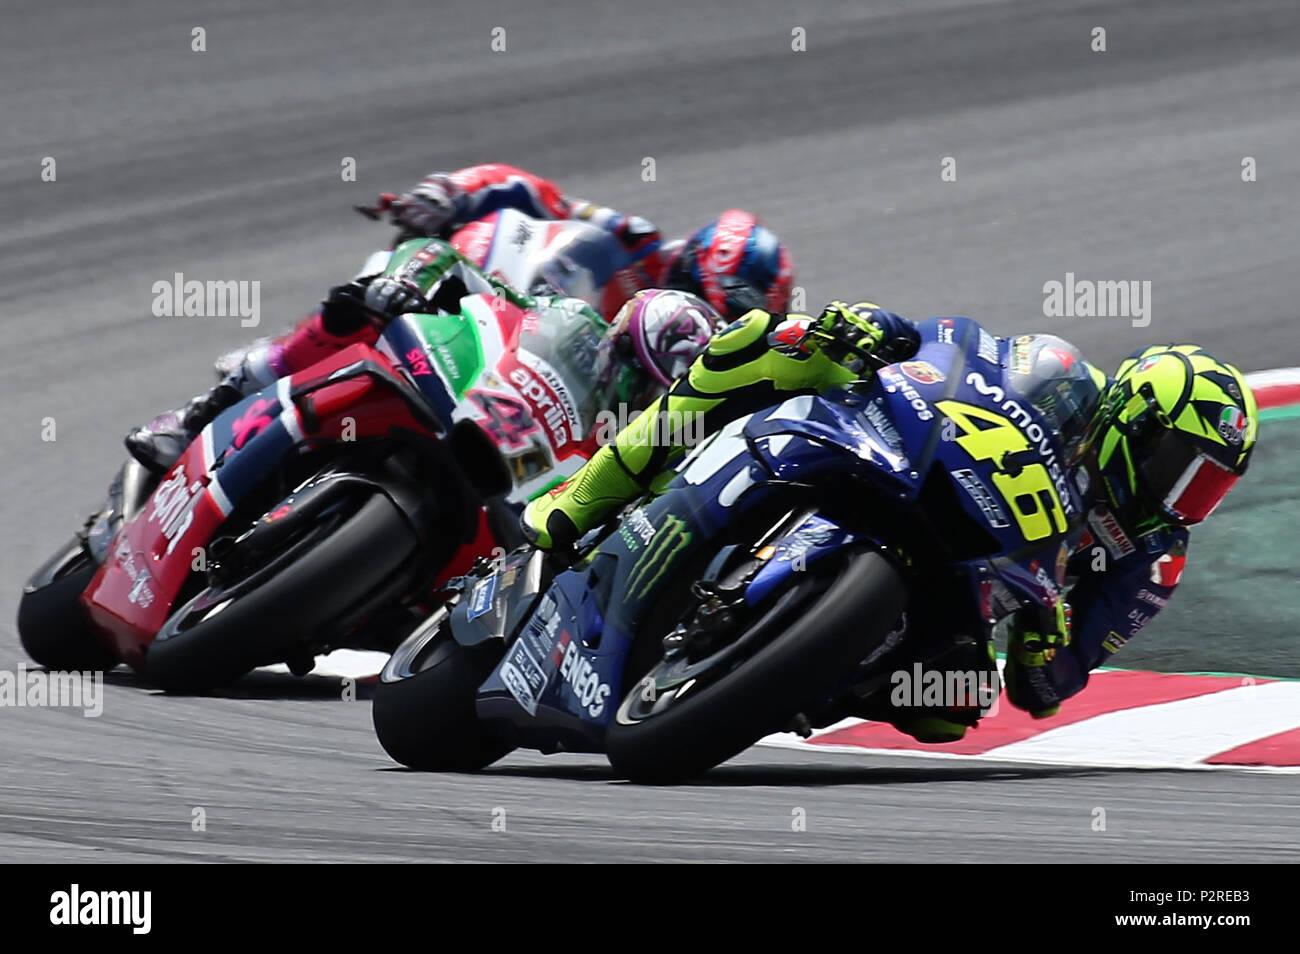 Barcelona -16th June 2018- SPAIN: Valentino Rossi (Yamaha) during the qualifying of the GP Catalunya Moto GP, in the Barcelona-Catalunya Circuit, on 16th June 2018. Photo: Joan Valls/Urbanandsport/Cordon Press - Stock Image